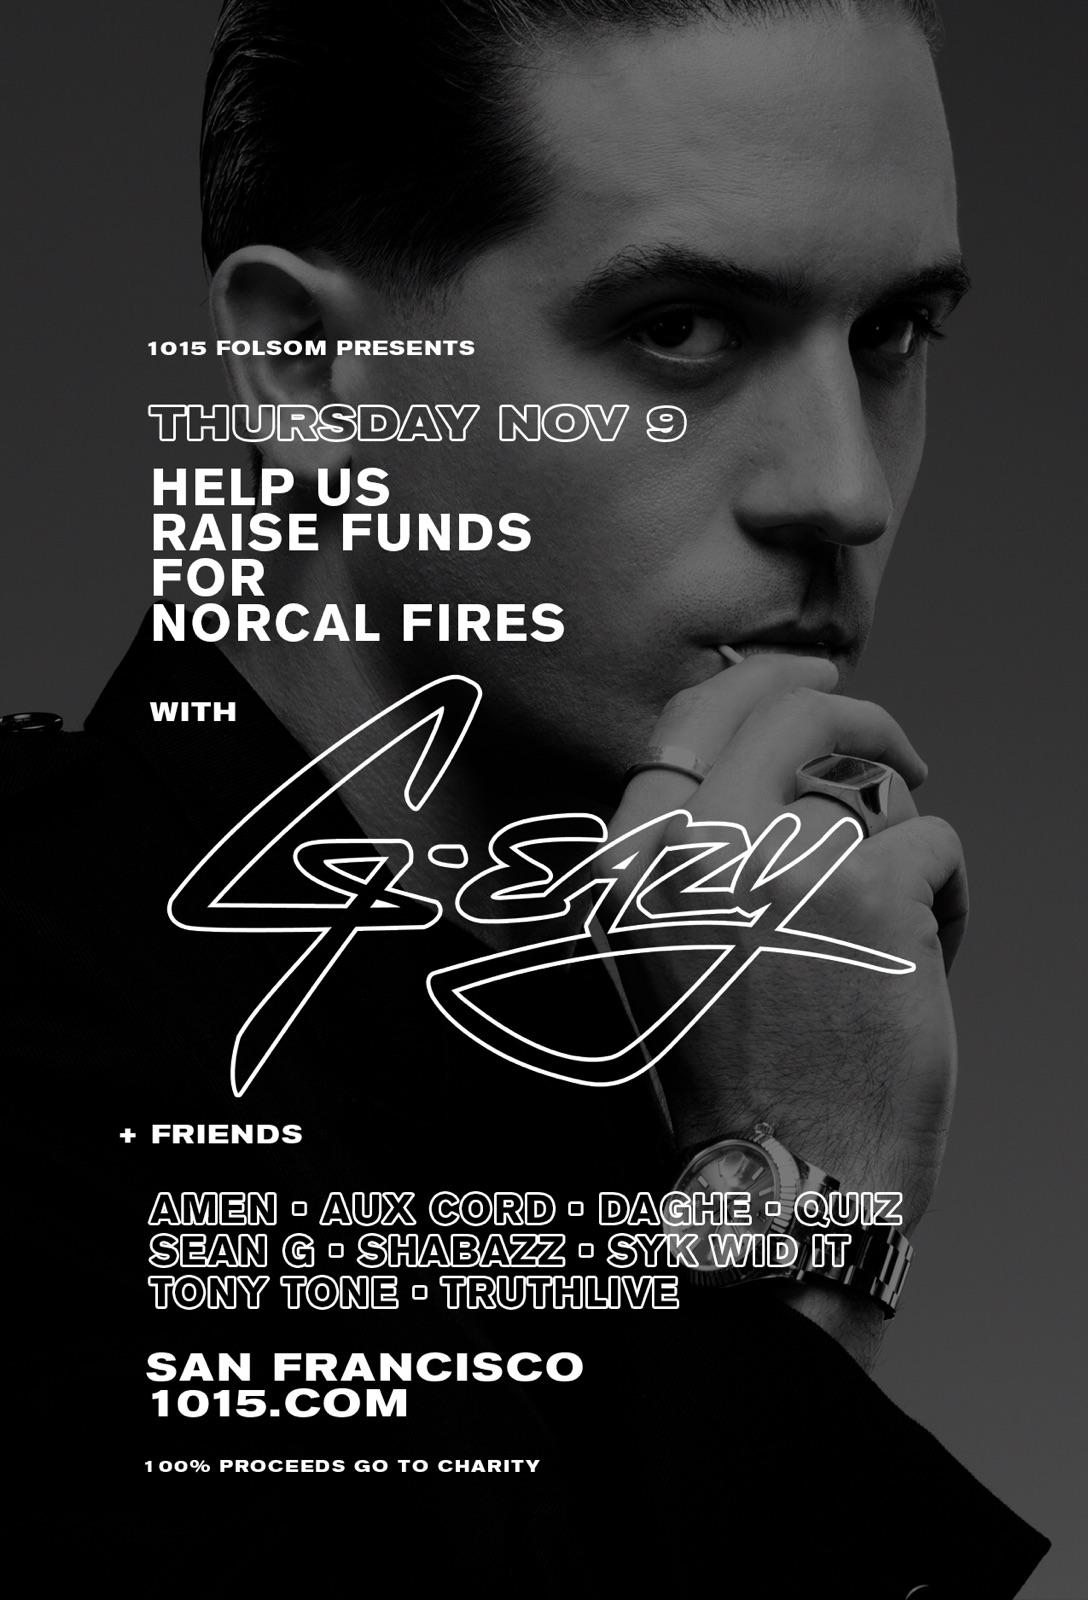 G-Eazy's Fire Relief Fundraiser